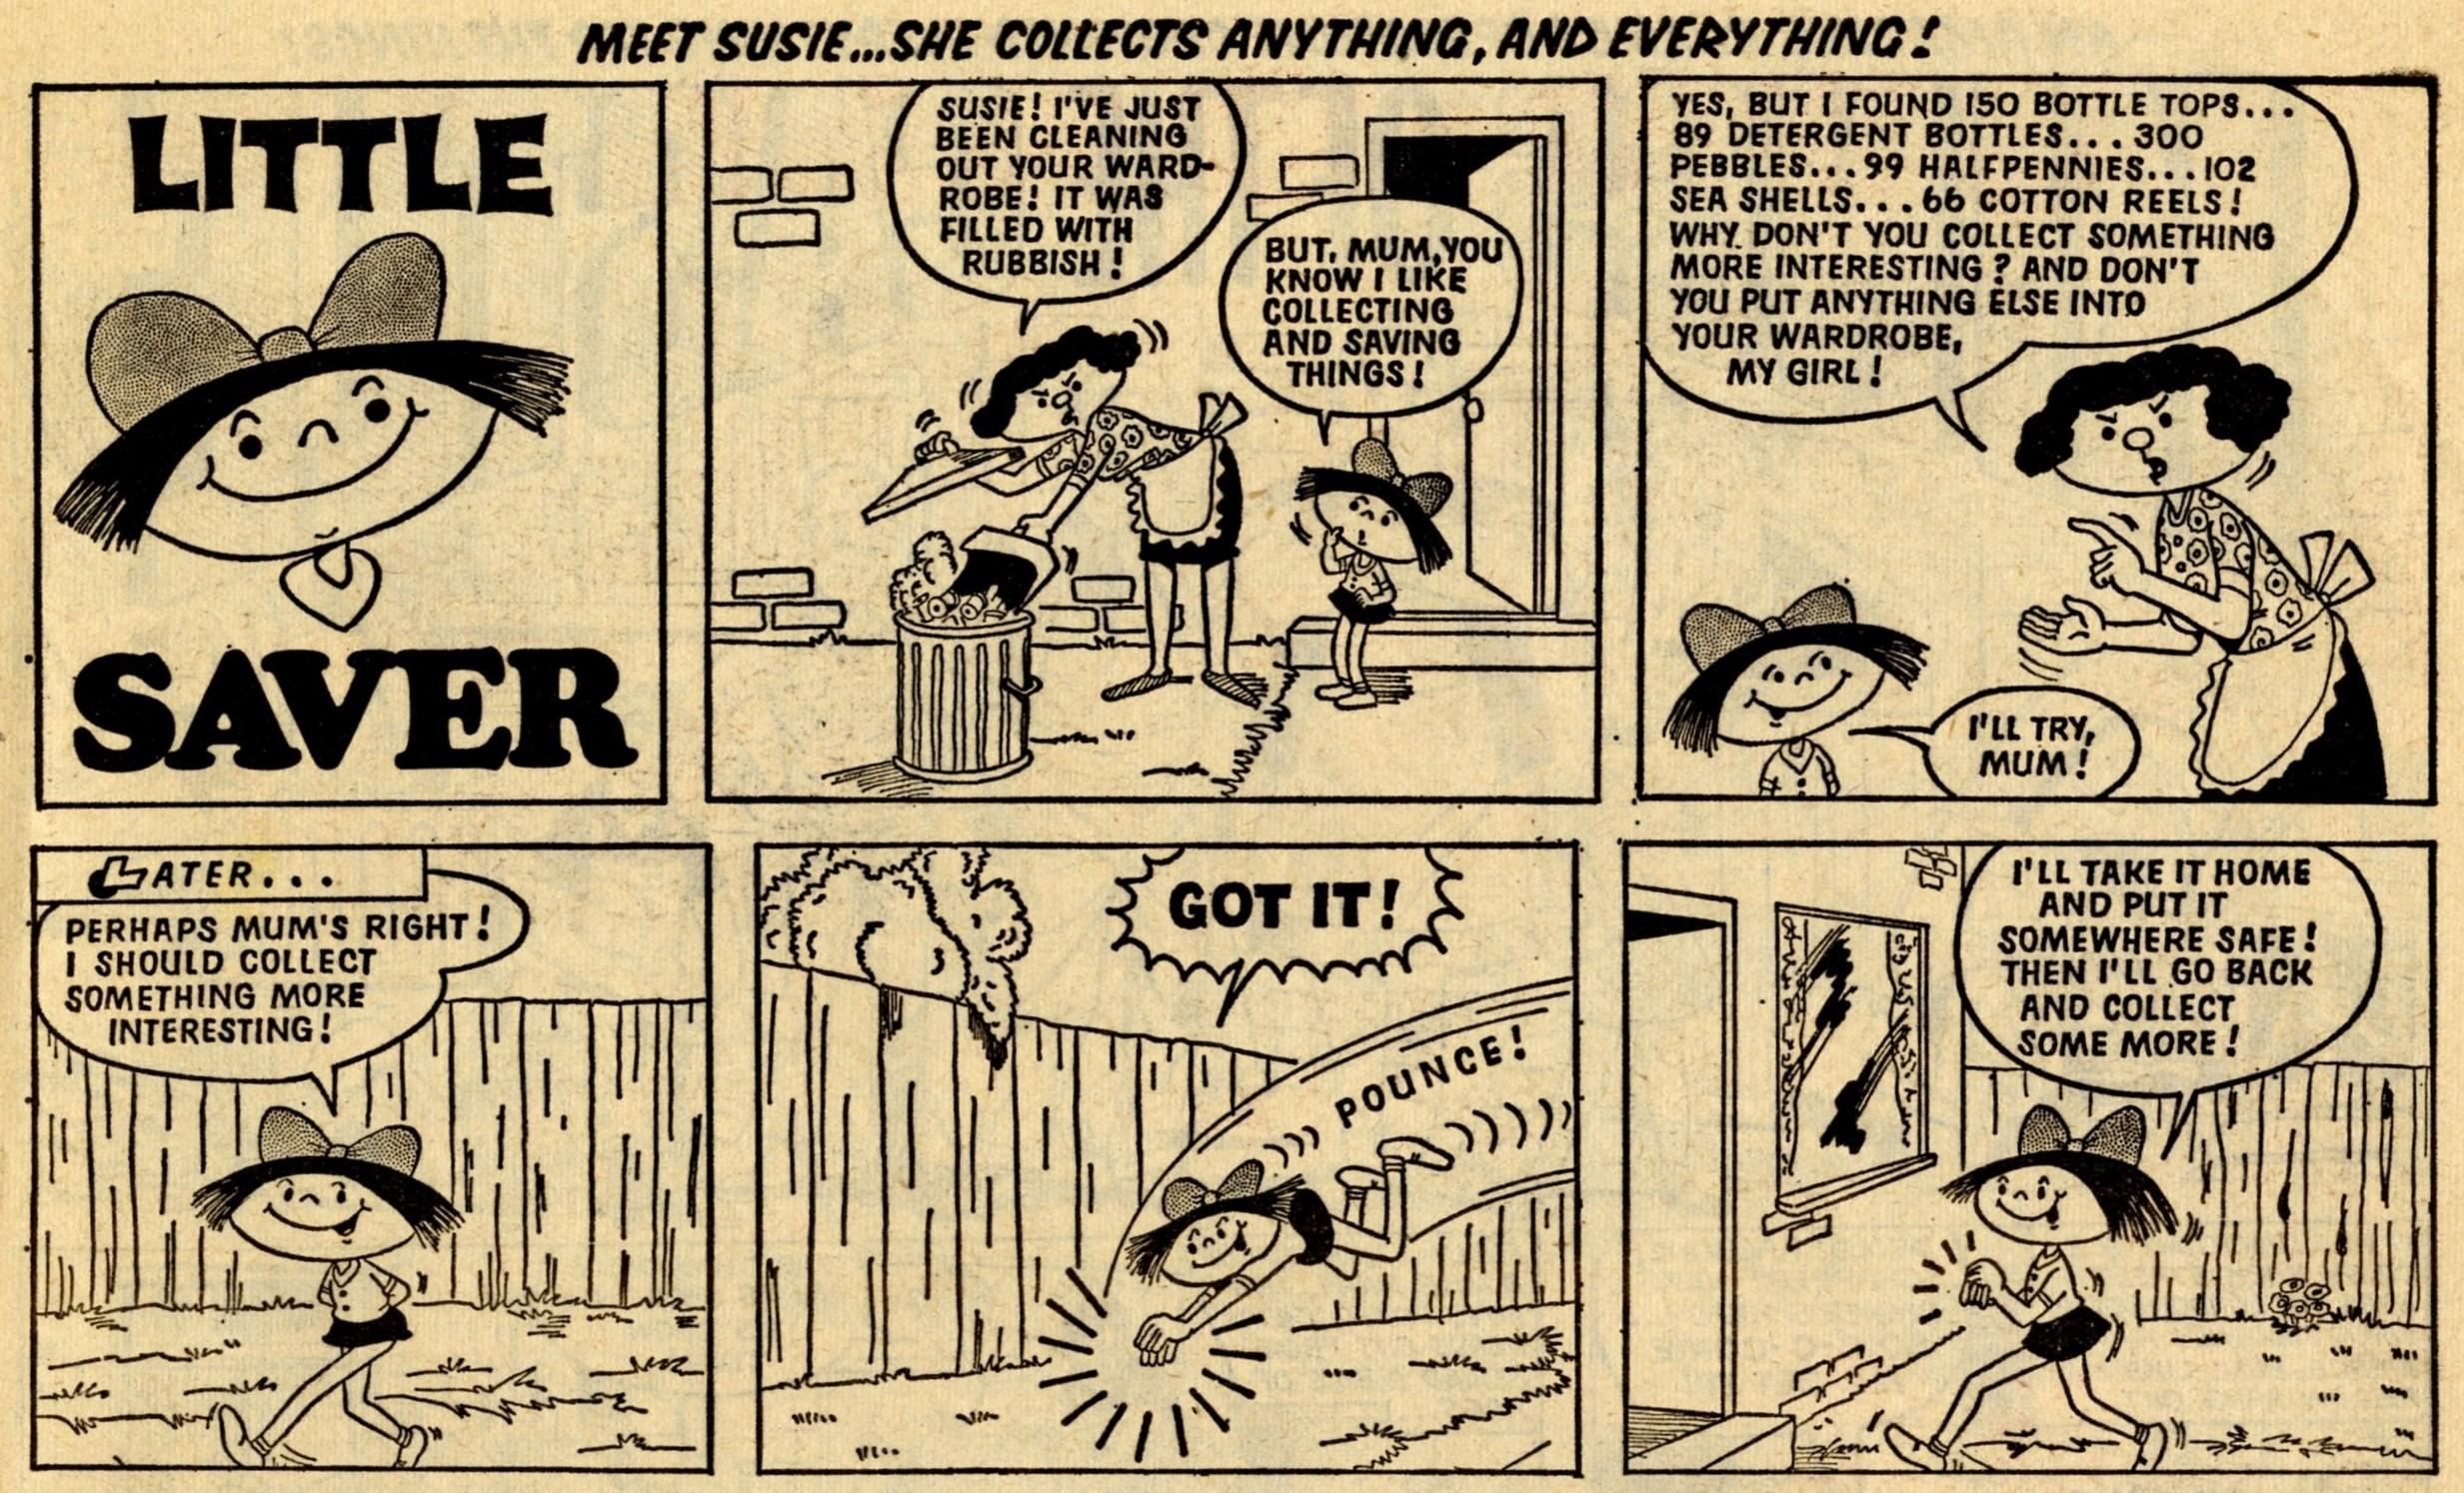 Little Saver: Terry Bave (artist)